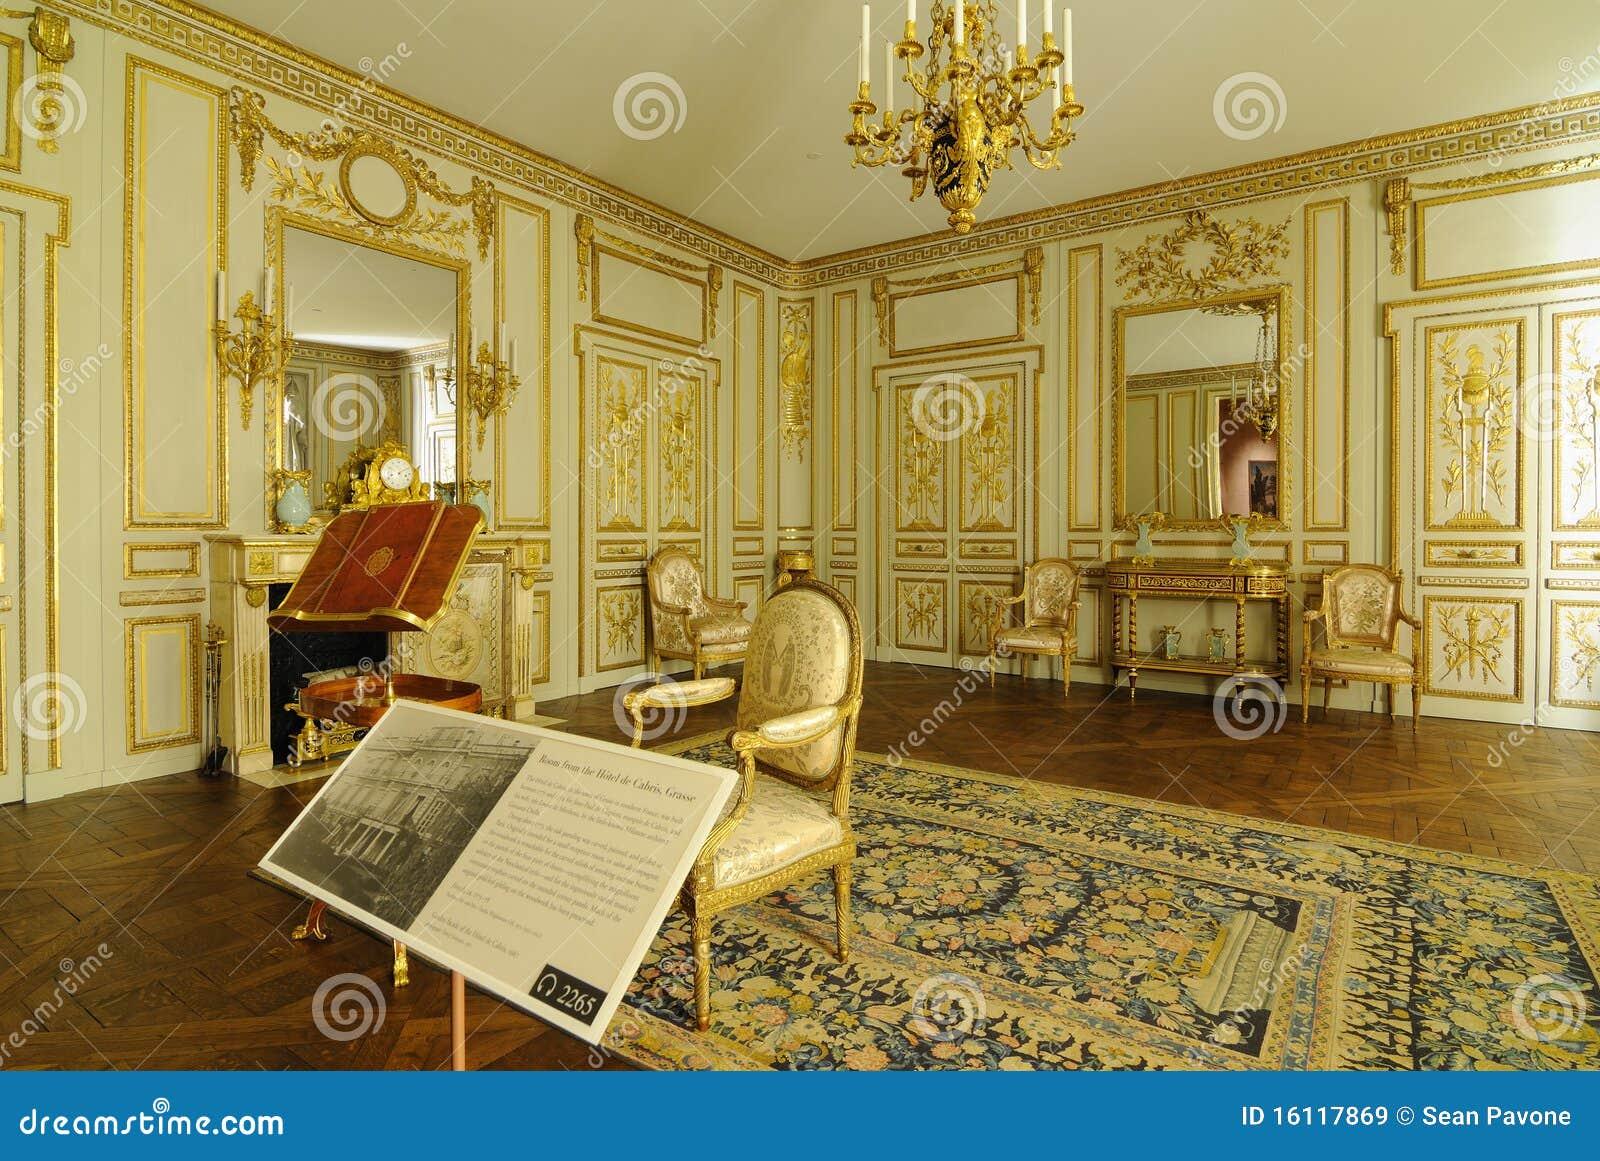 Muebles franceses del hotel imagen de archivo editorial for Muebles franceses